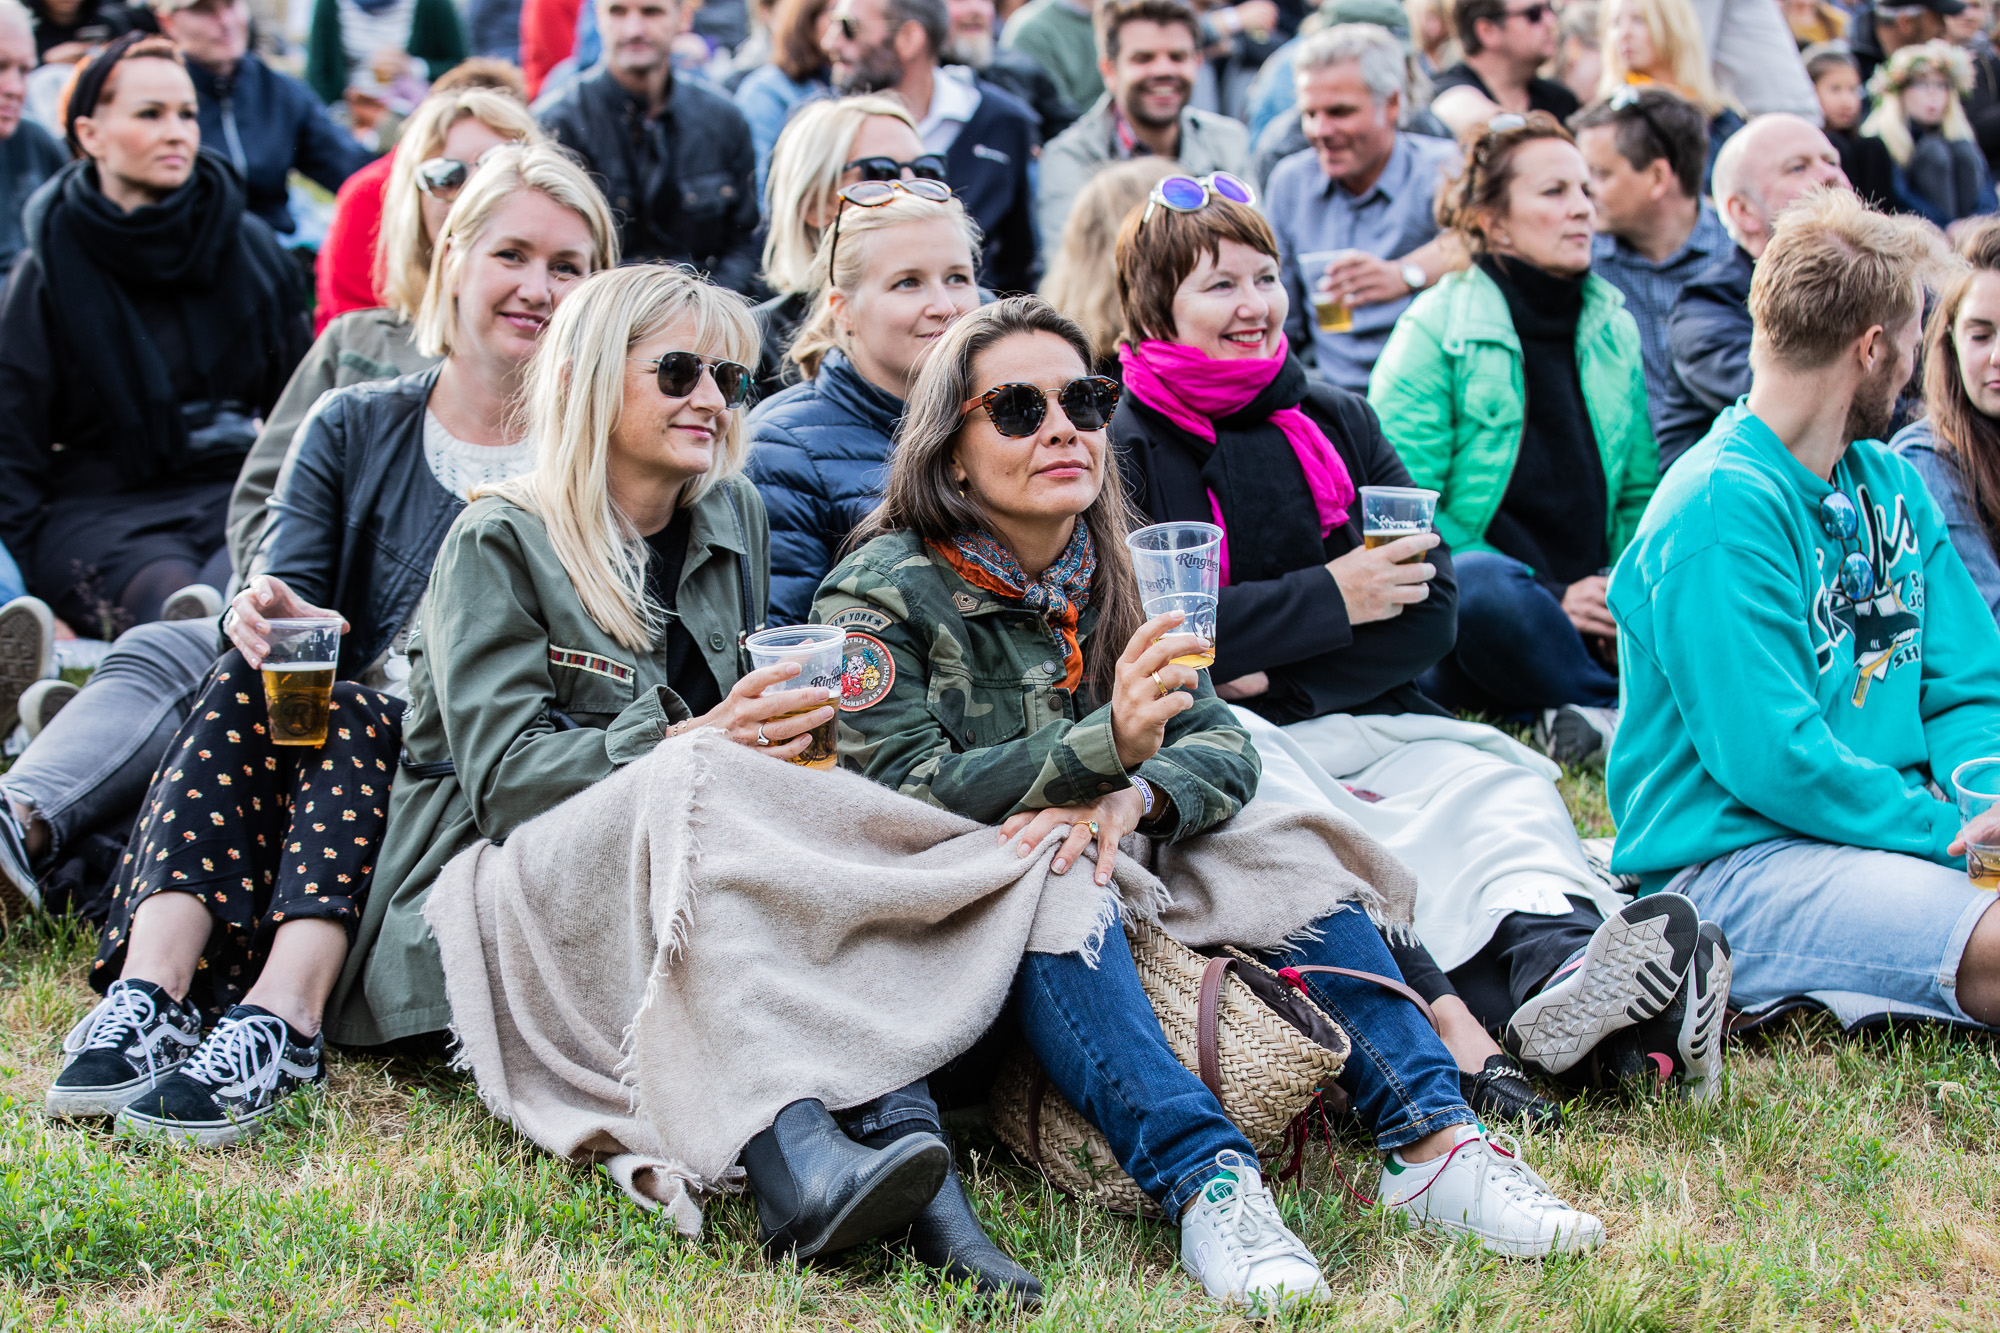 Jason Isbell and The 400 Unit @ Piknik i Parken 2018